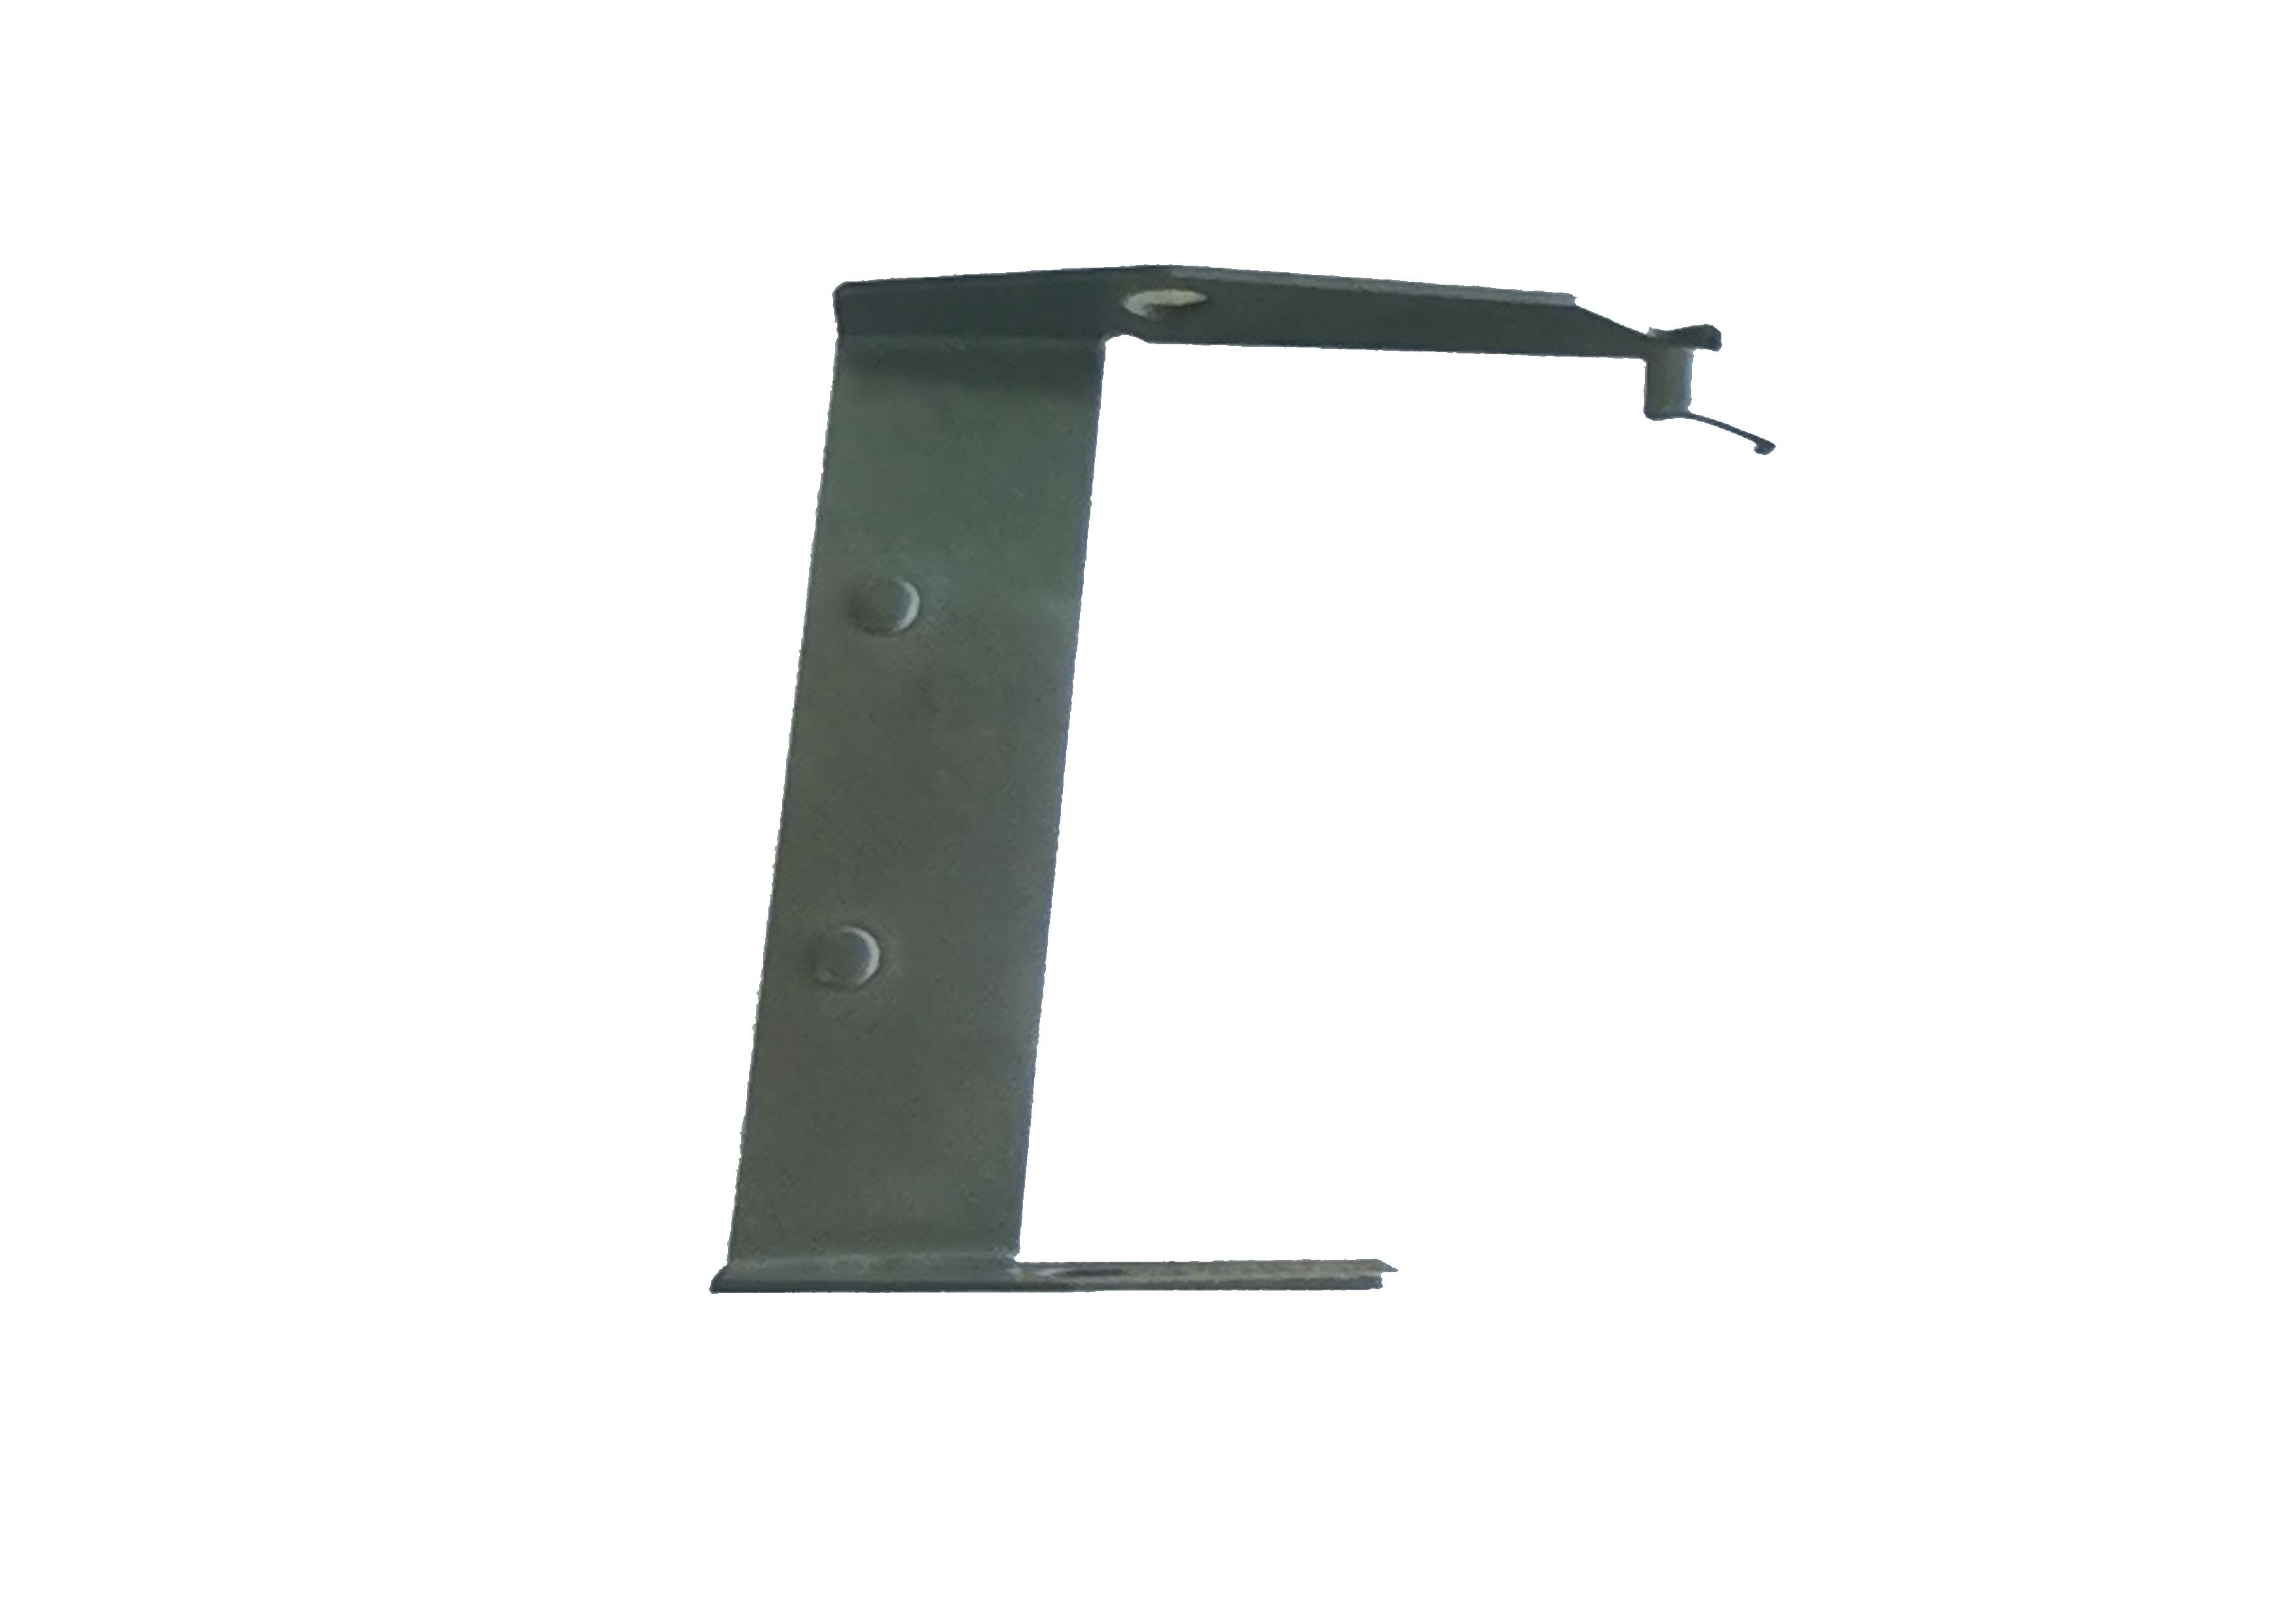 KXFA1PTEAAOO44mm保险扣